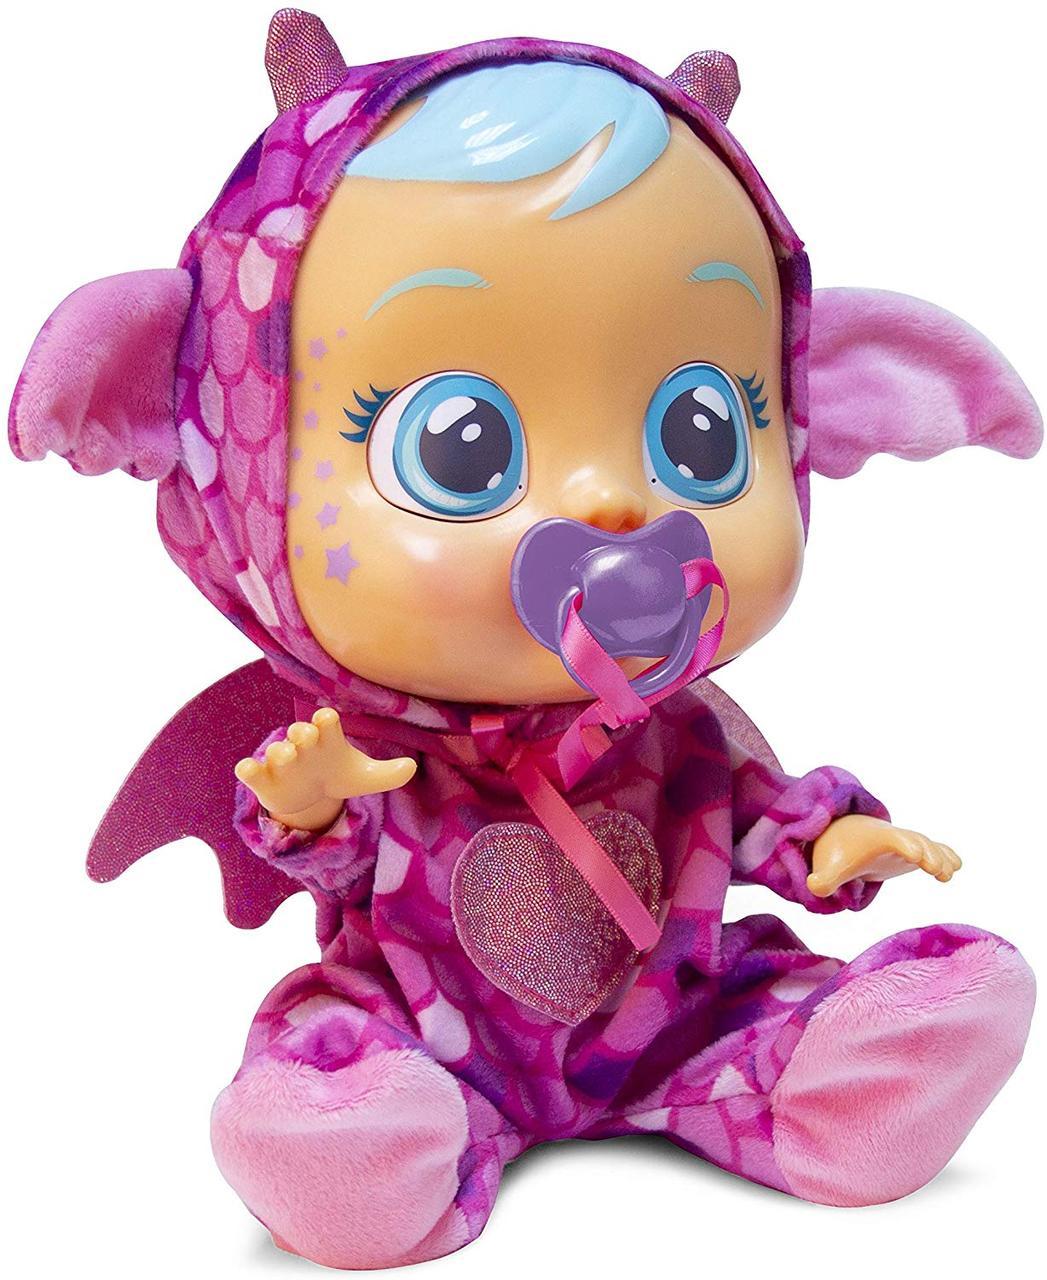 Лялька пупс плакса Бруні дракончик MC Toys Cry Babies Bruny The Dragon